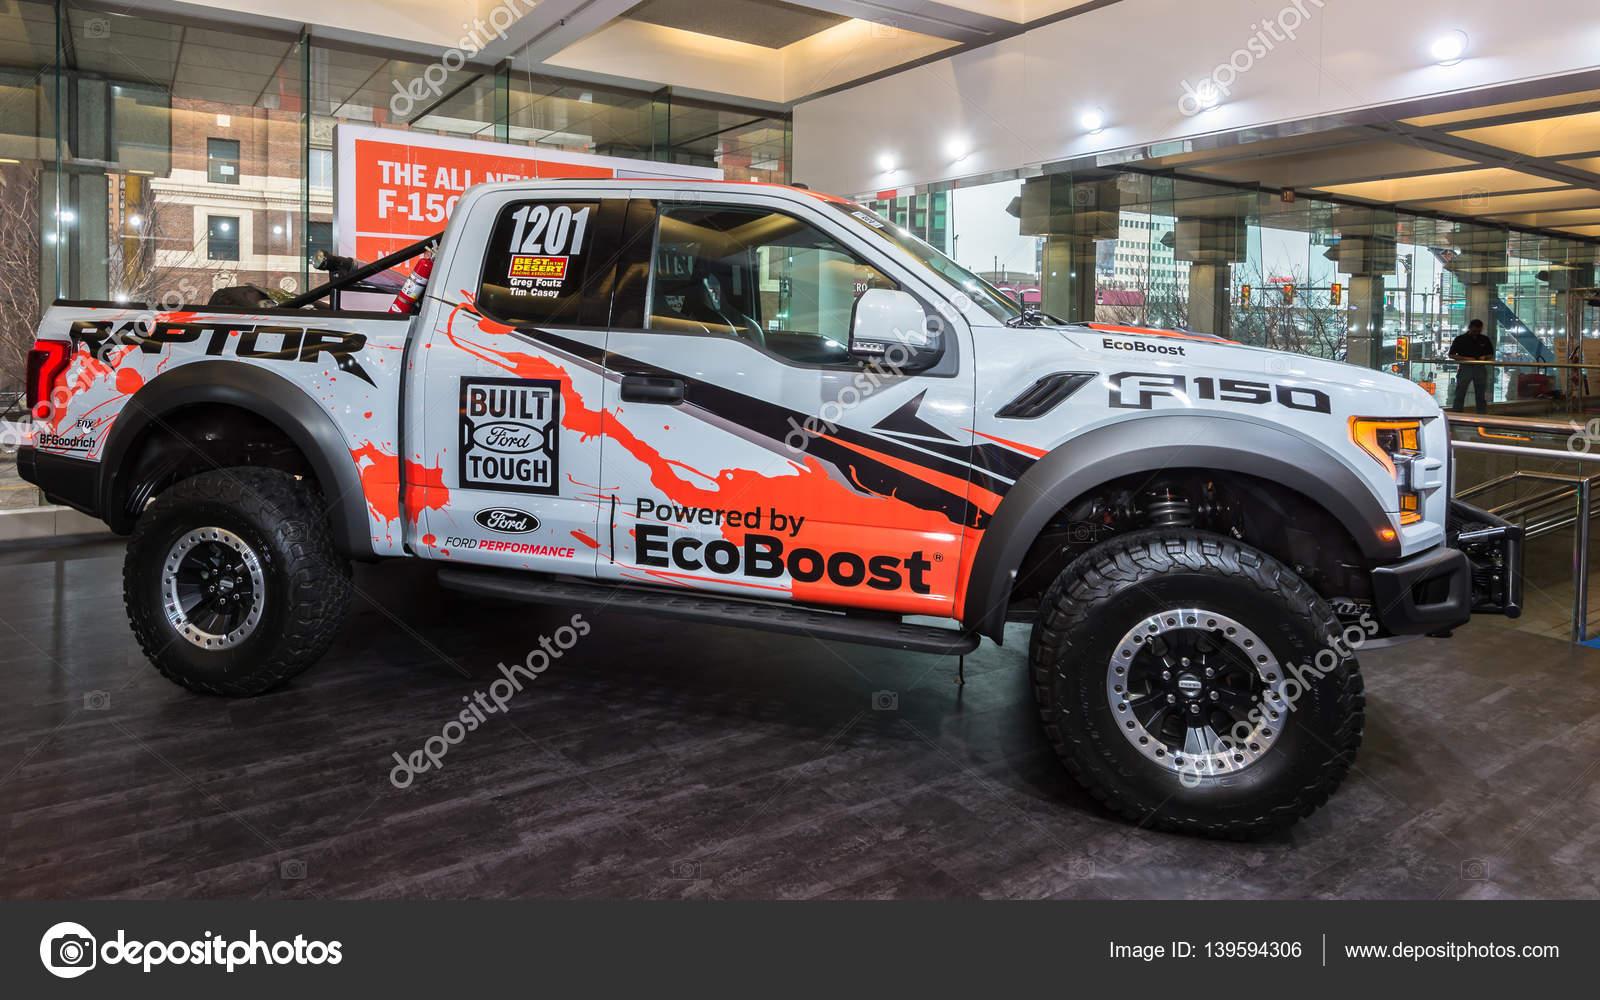 44 объявления - Продажа грузовиков Ford (Форд), купить ...